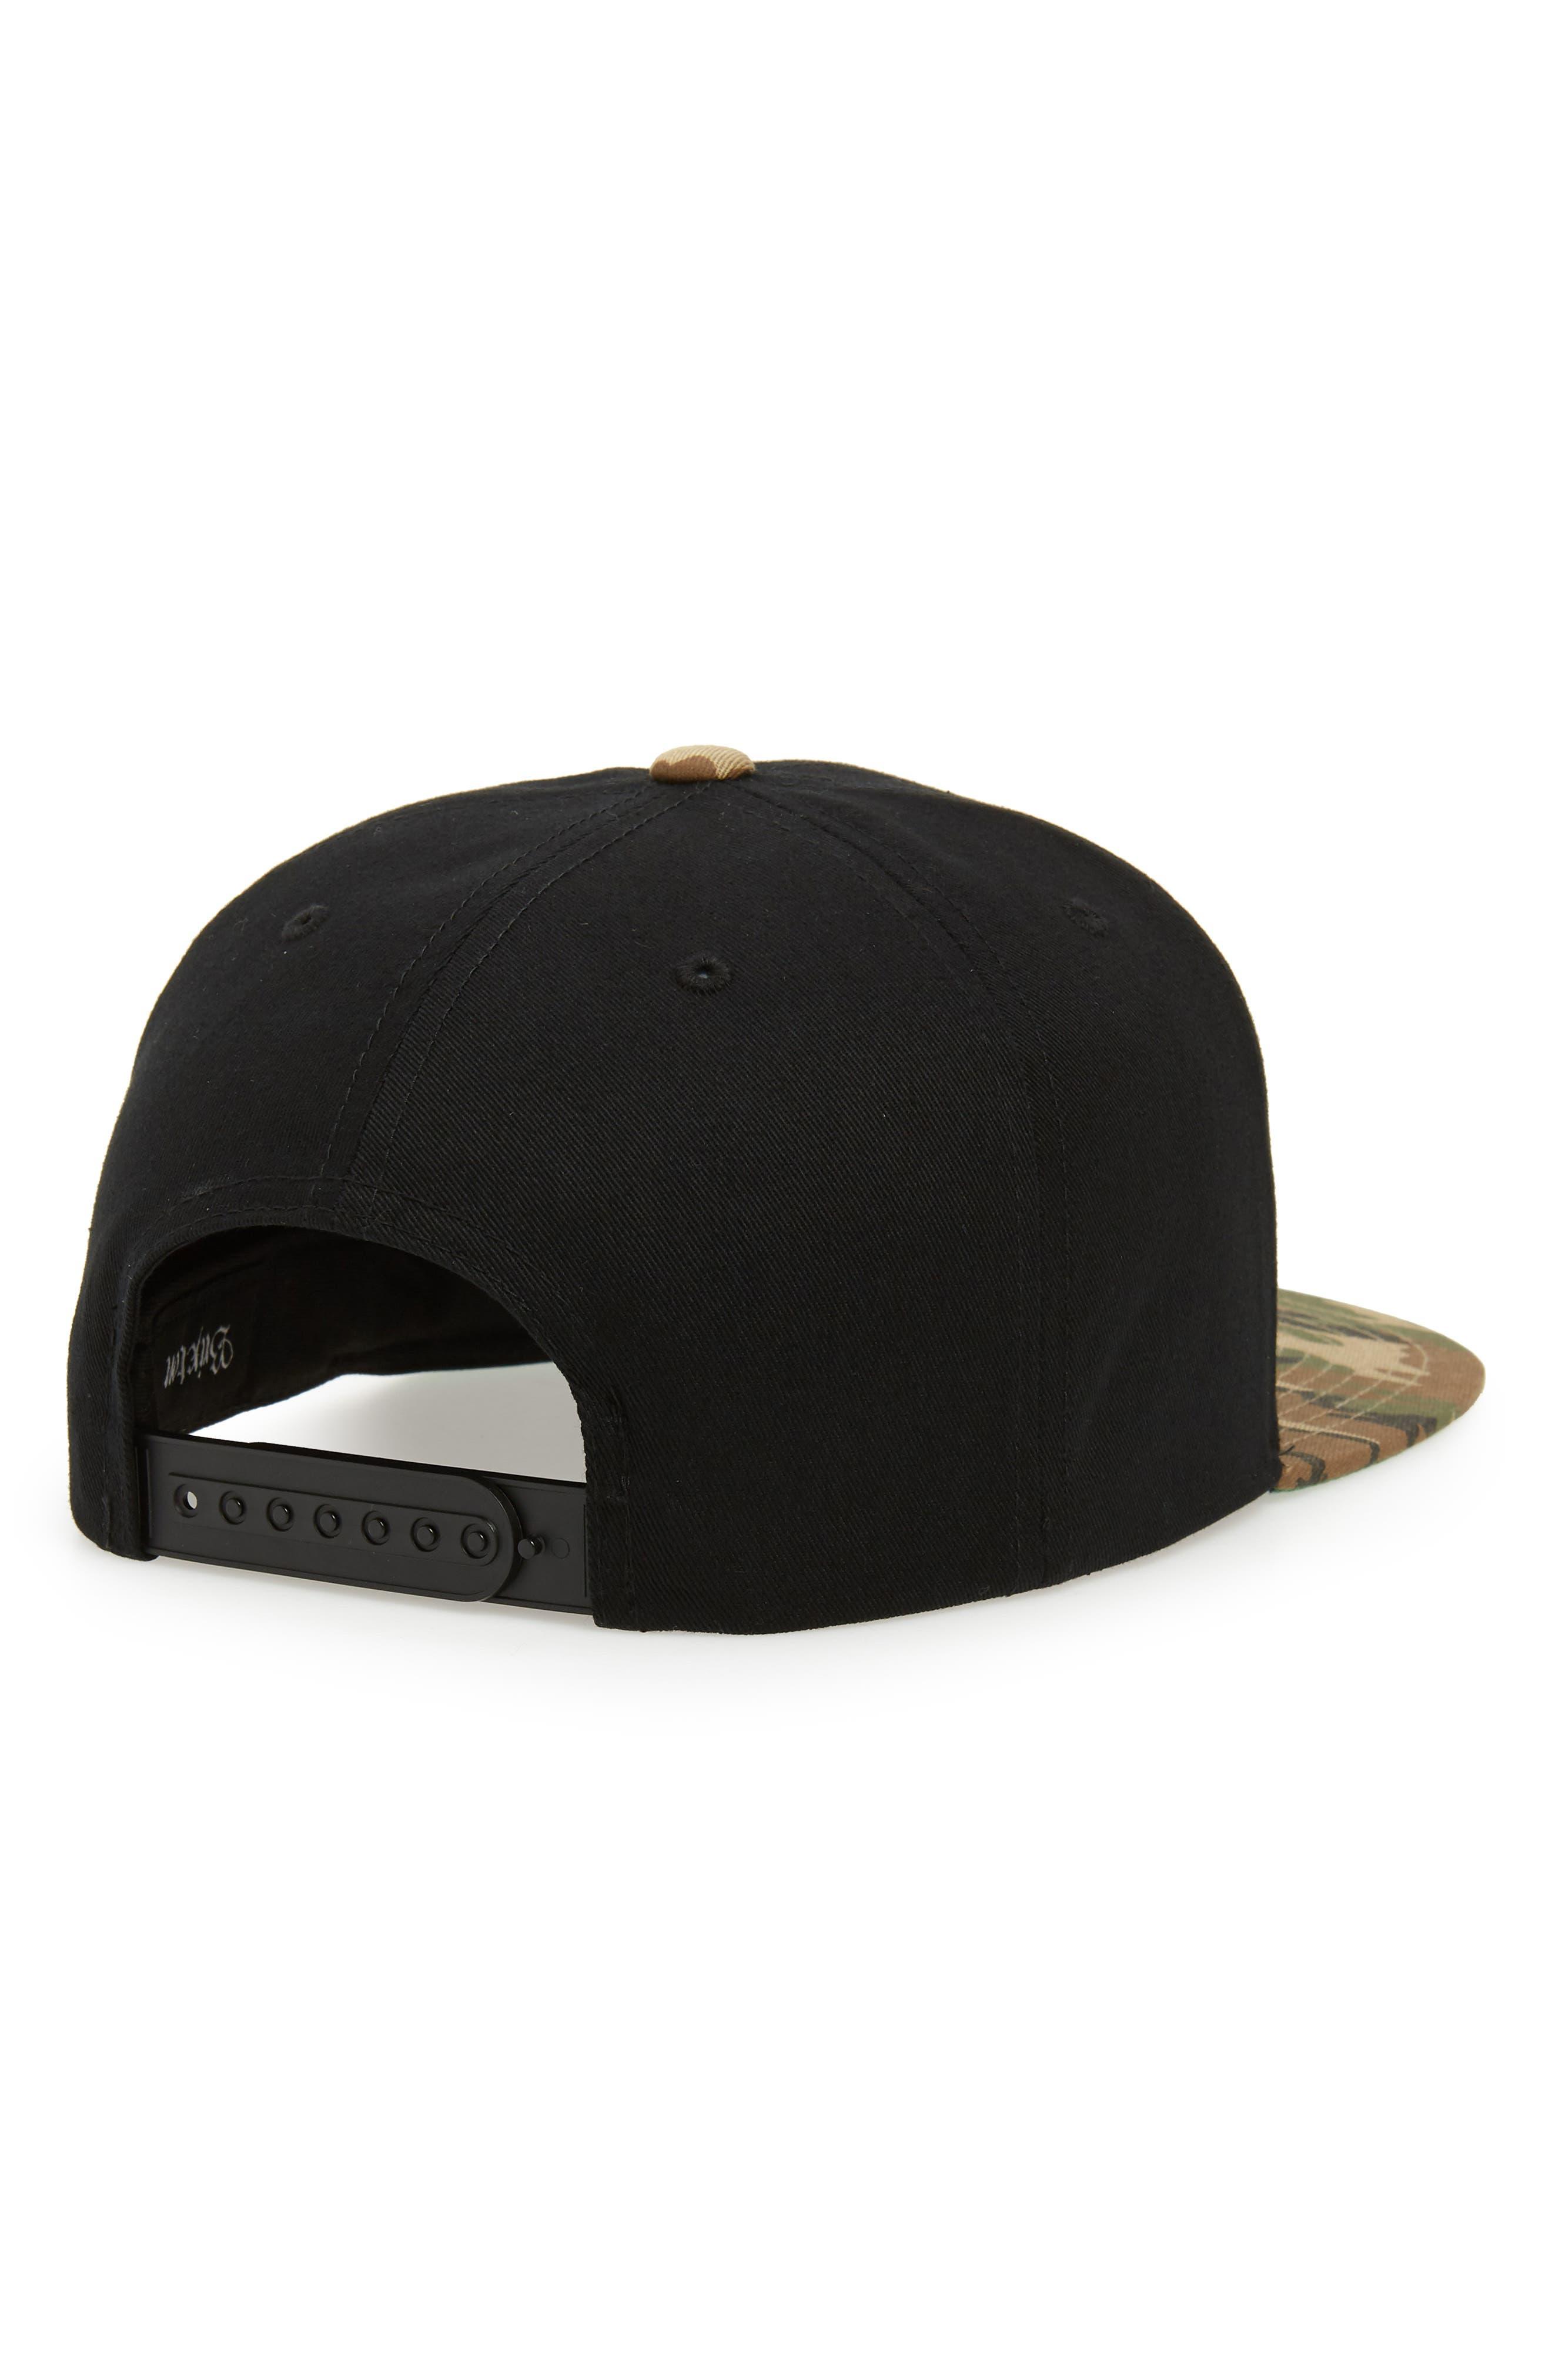 'Wheeler' Snapback Cap,                             Alternate thumbnail 2, color,                             BLACK/ CAMO